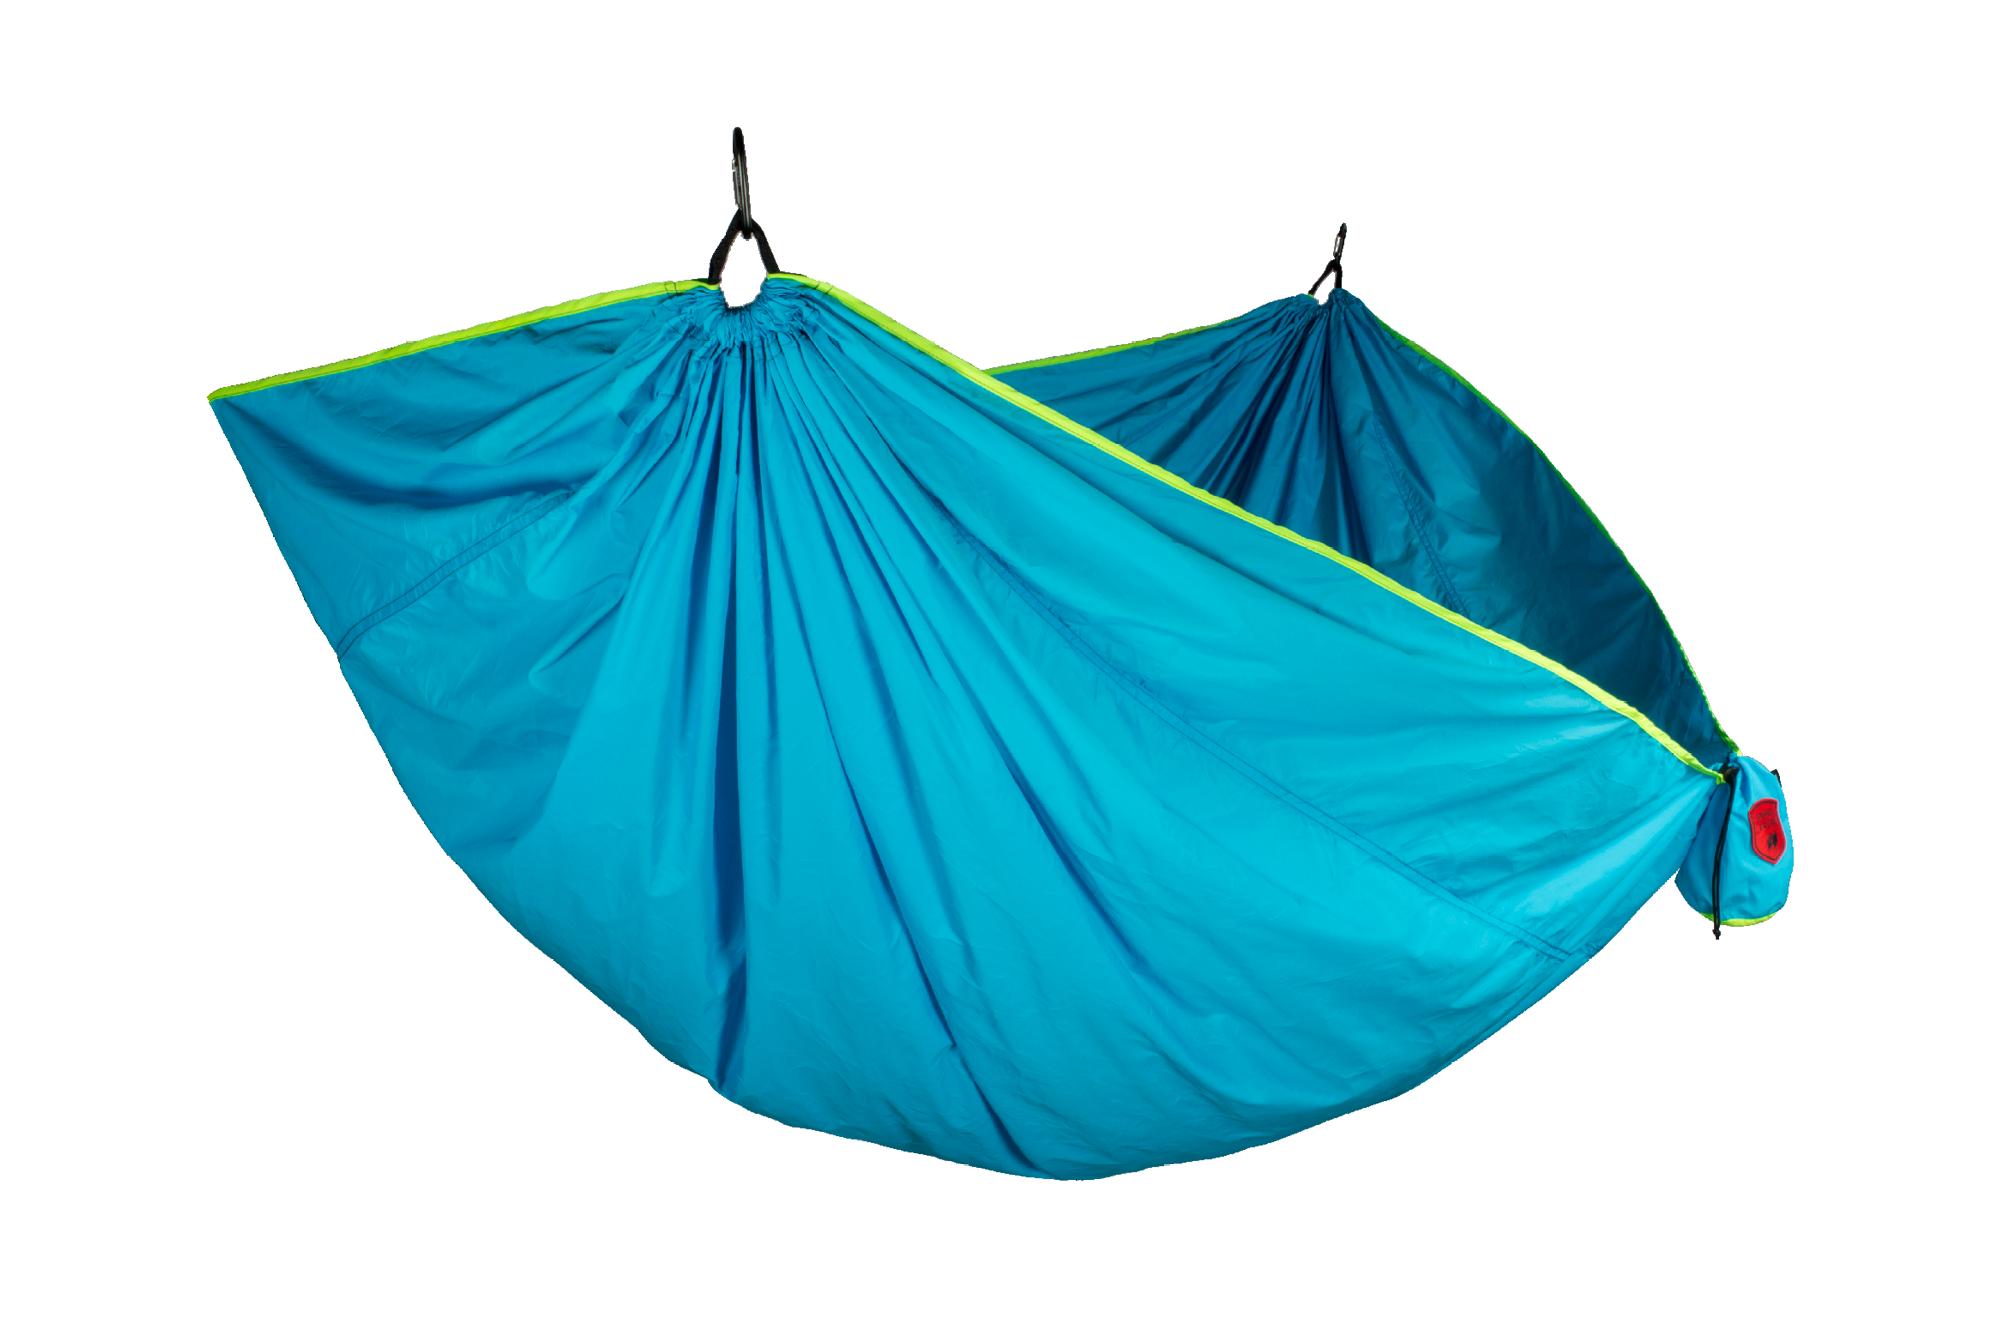 Onemade double the best. Hammock clipart lie in hammock